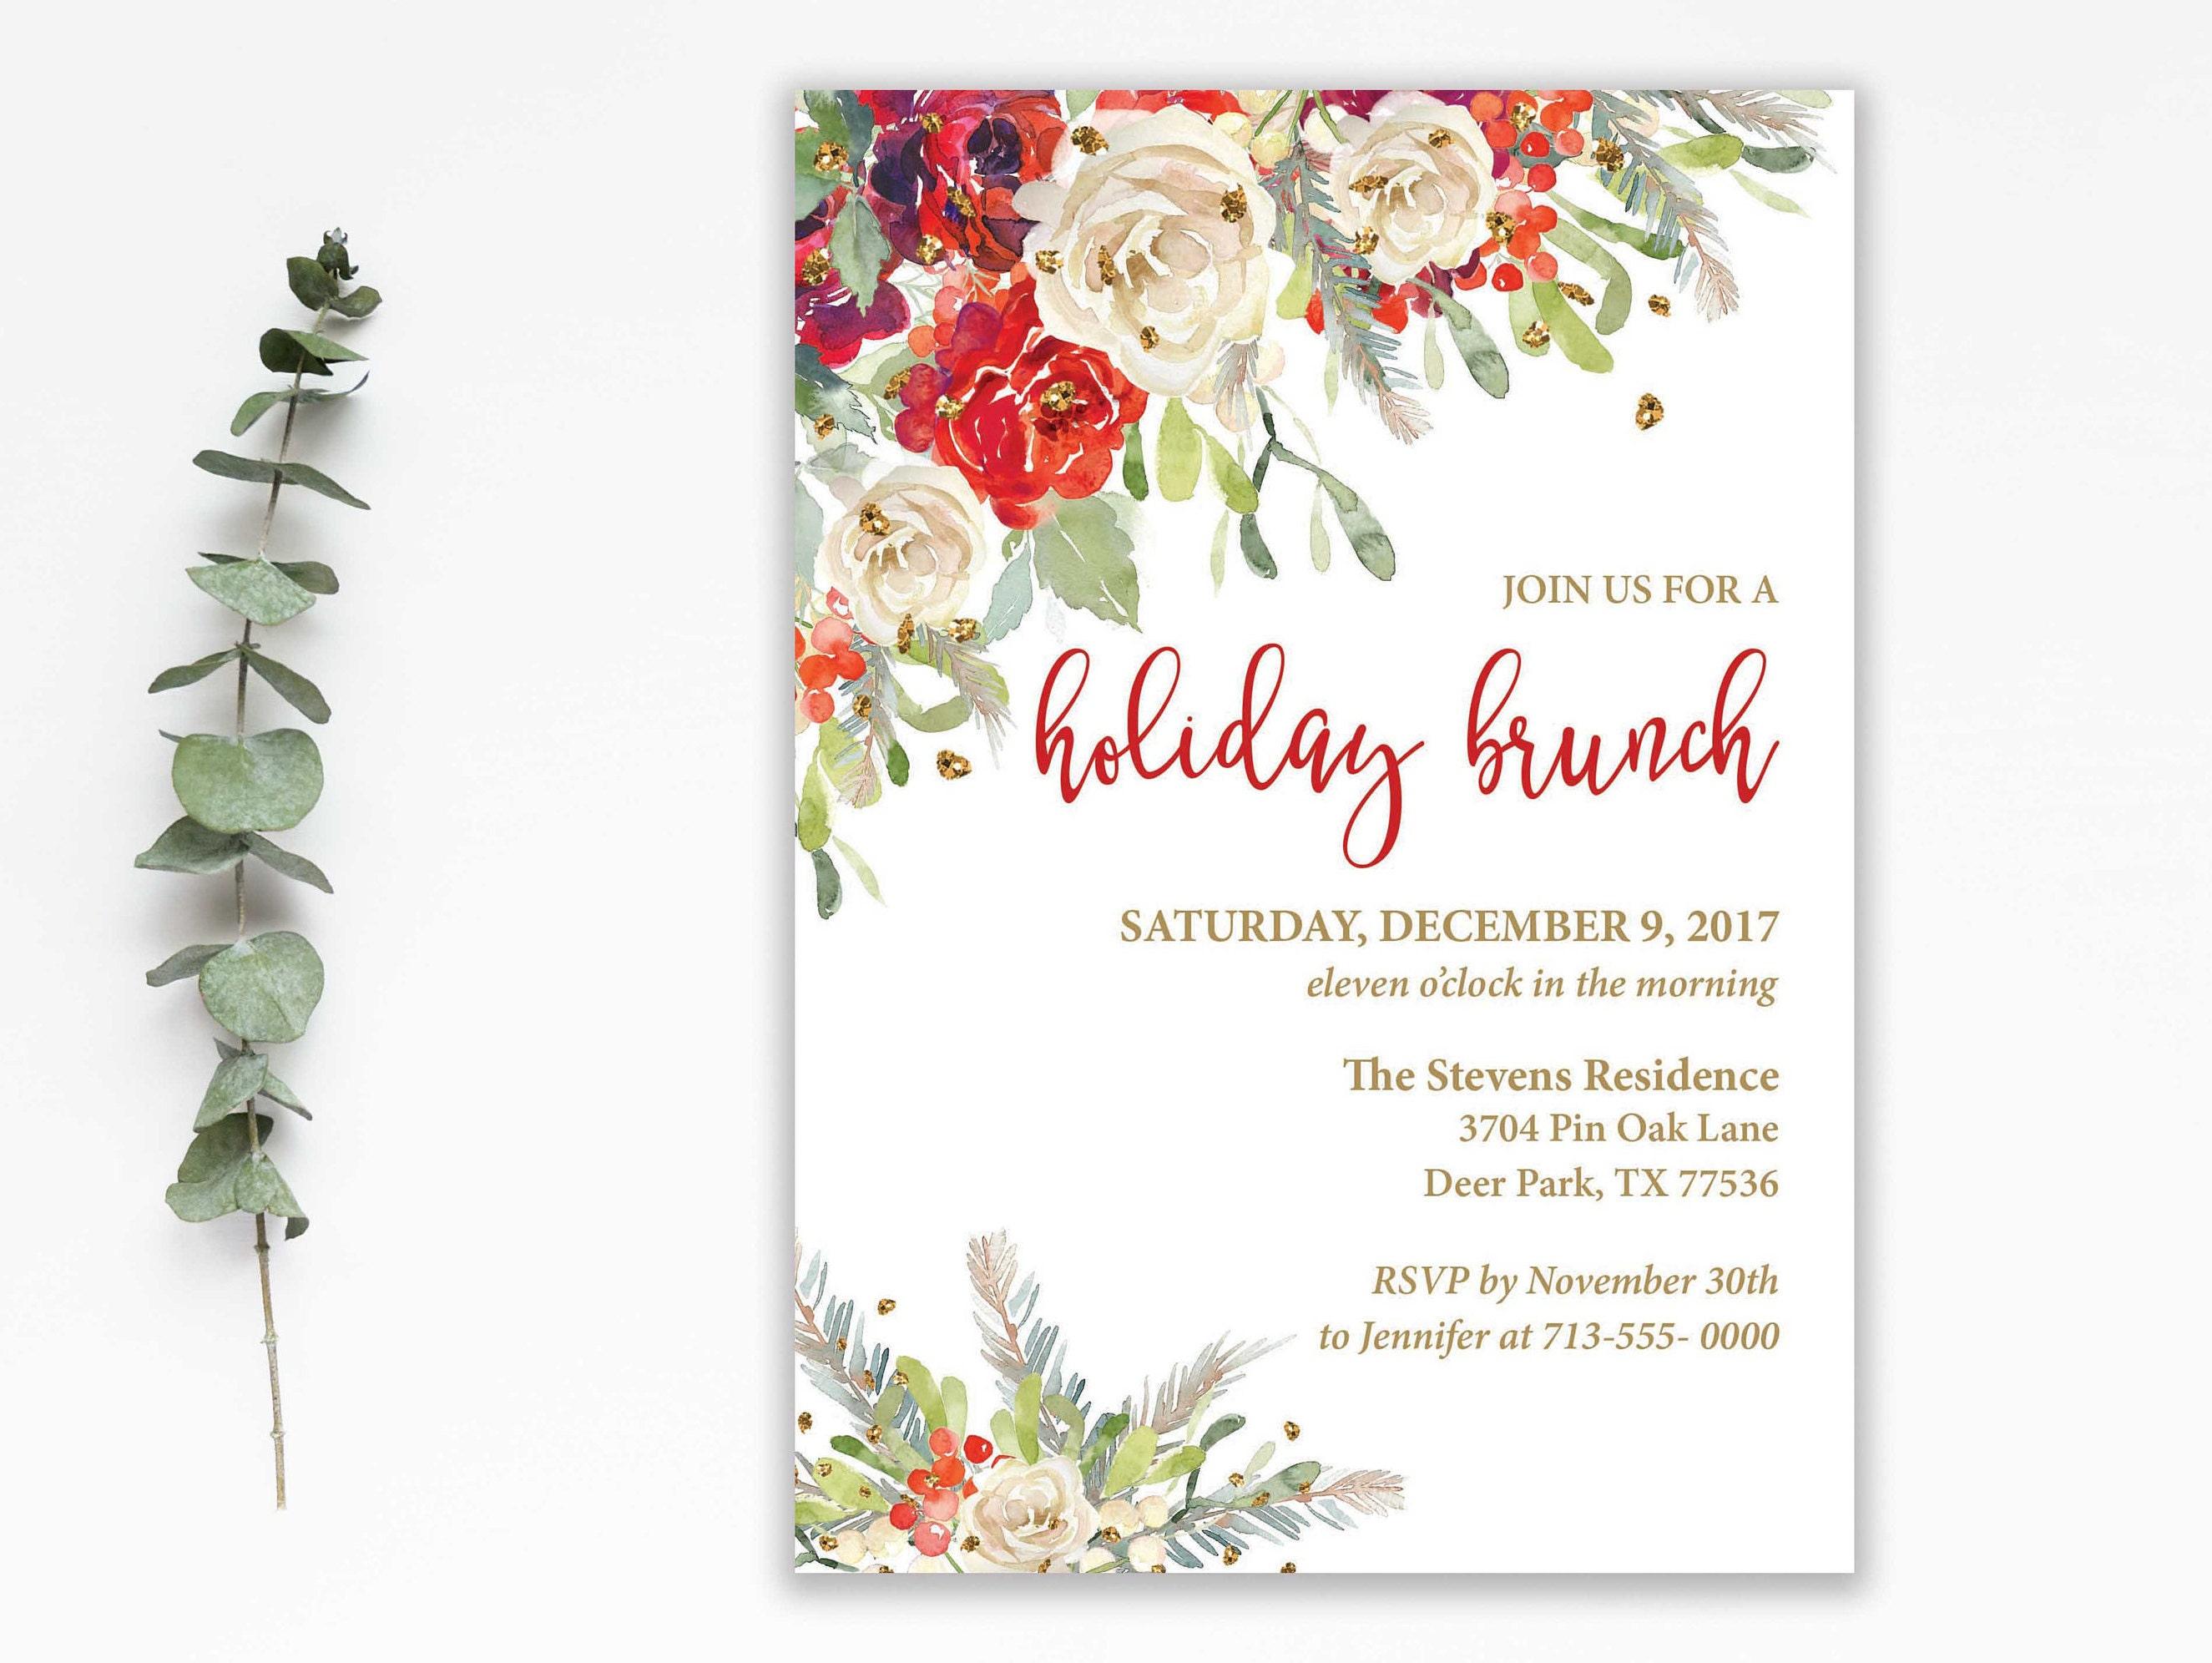 holiday brunch invitation christmas party invitation holiday